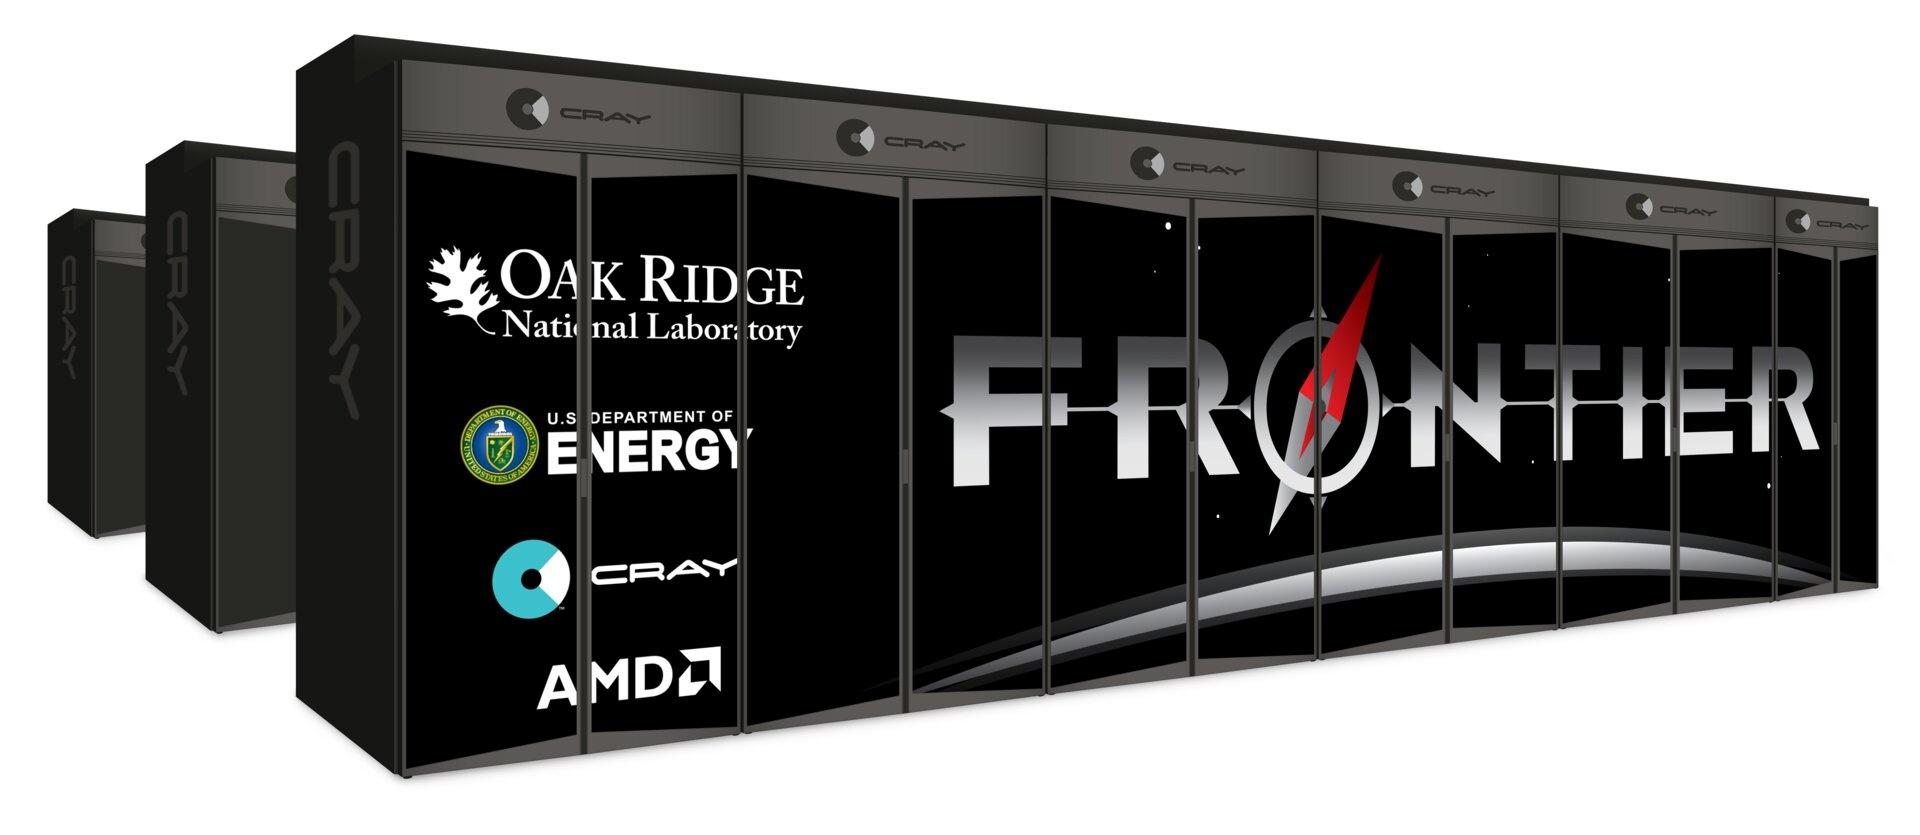 ... Frontier werden von Cray gebaut